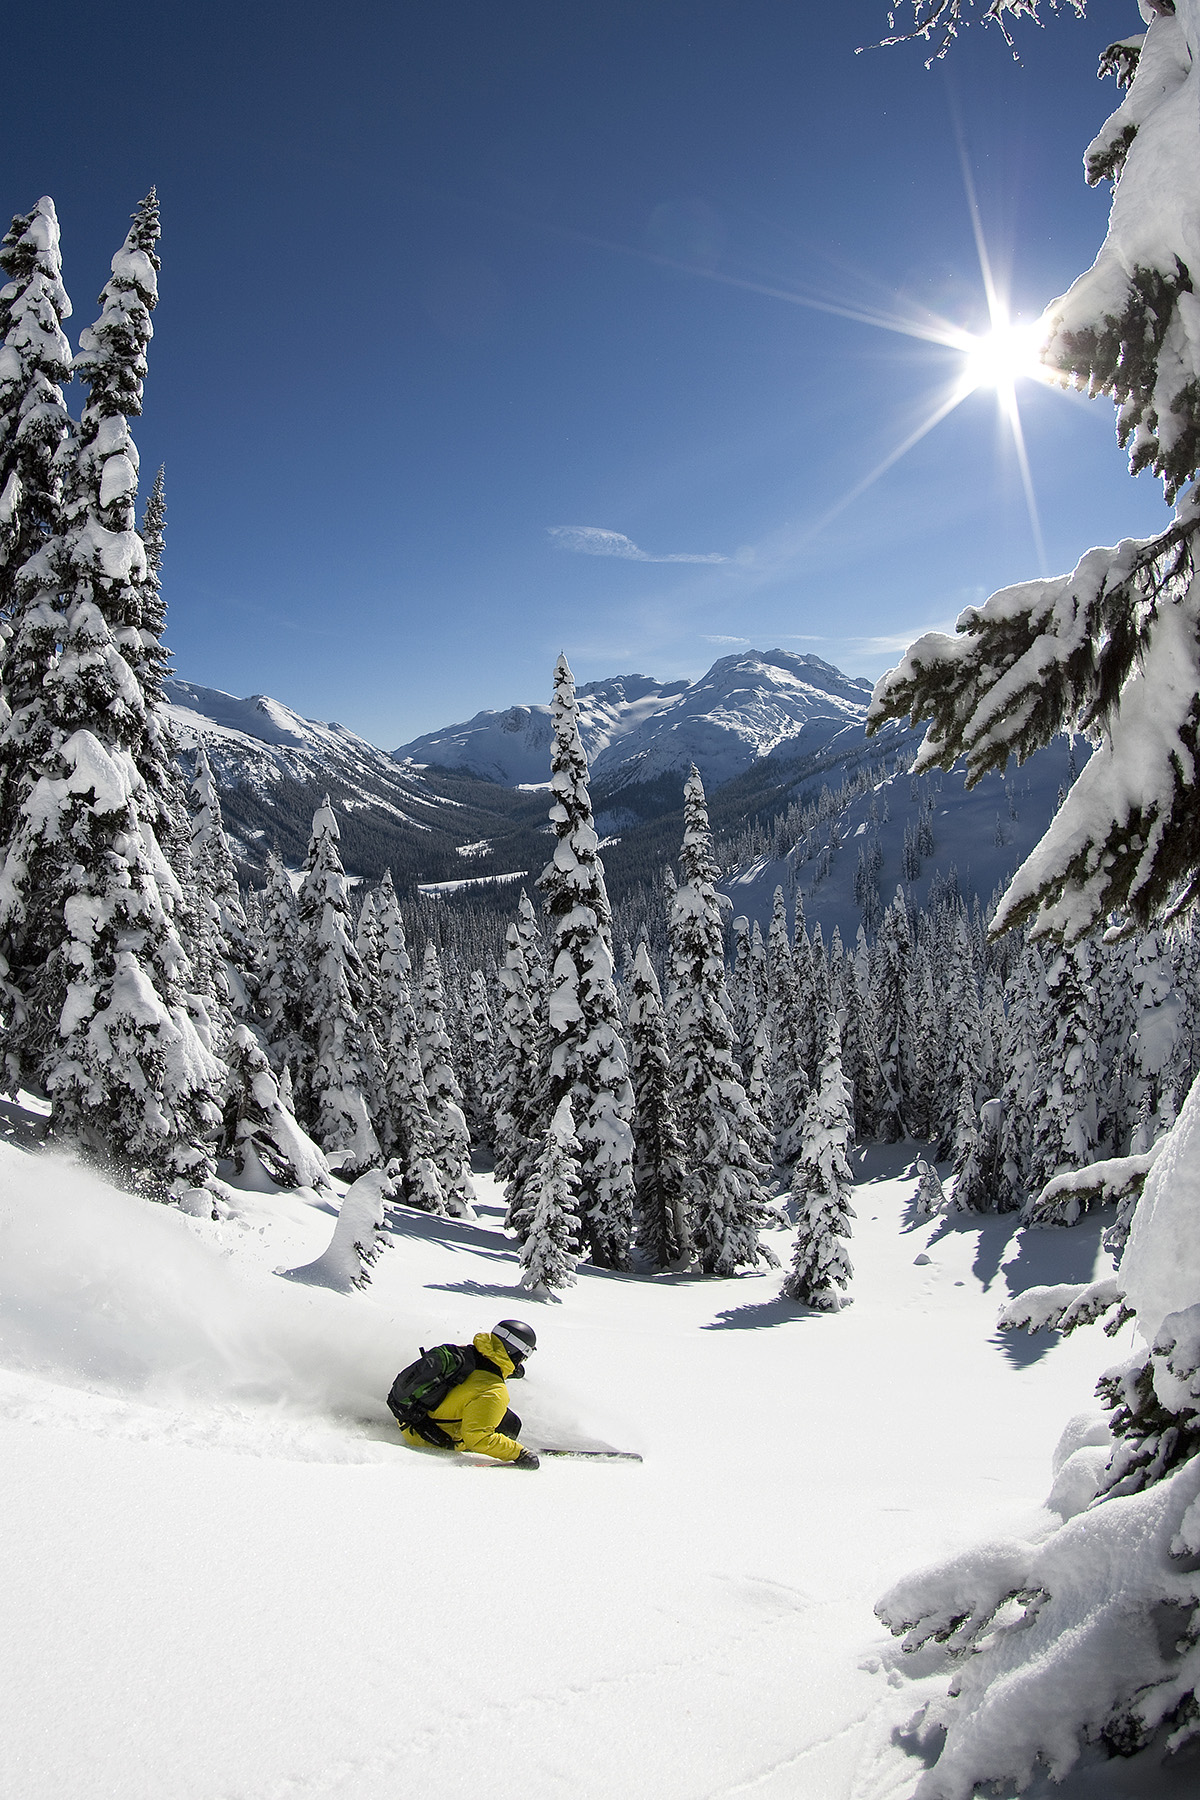 Ian Morrison skiing at Backcountry Snowcats, BC. Photo: Paul Morrison